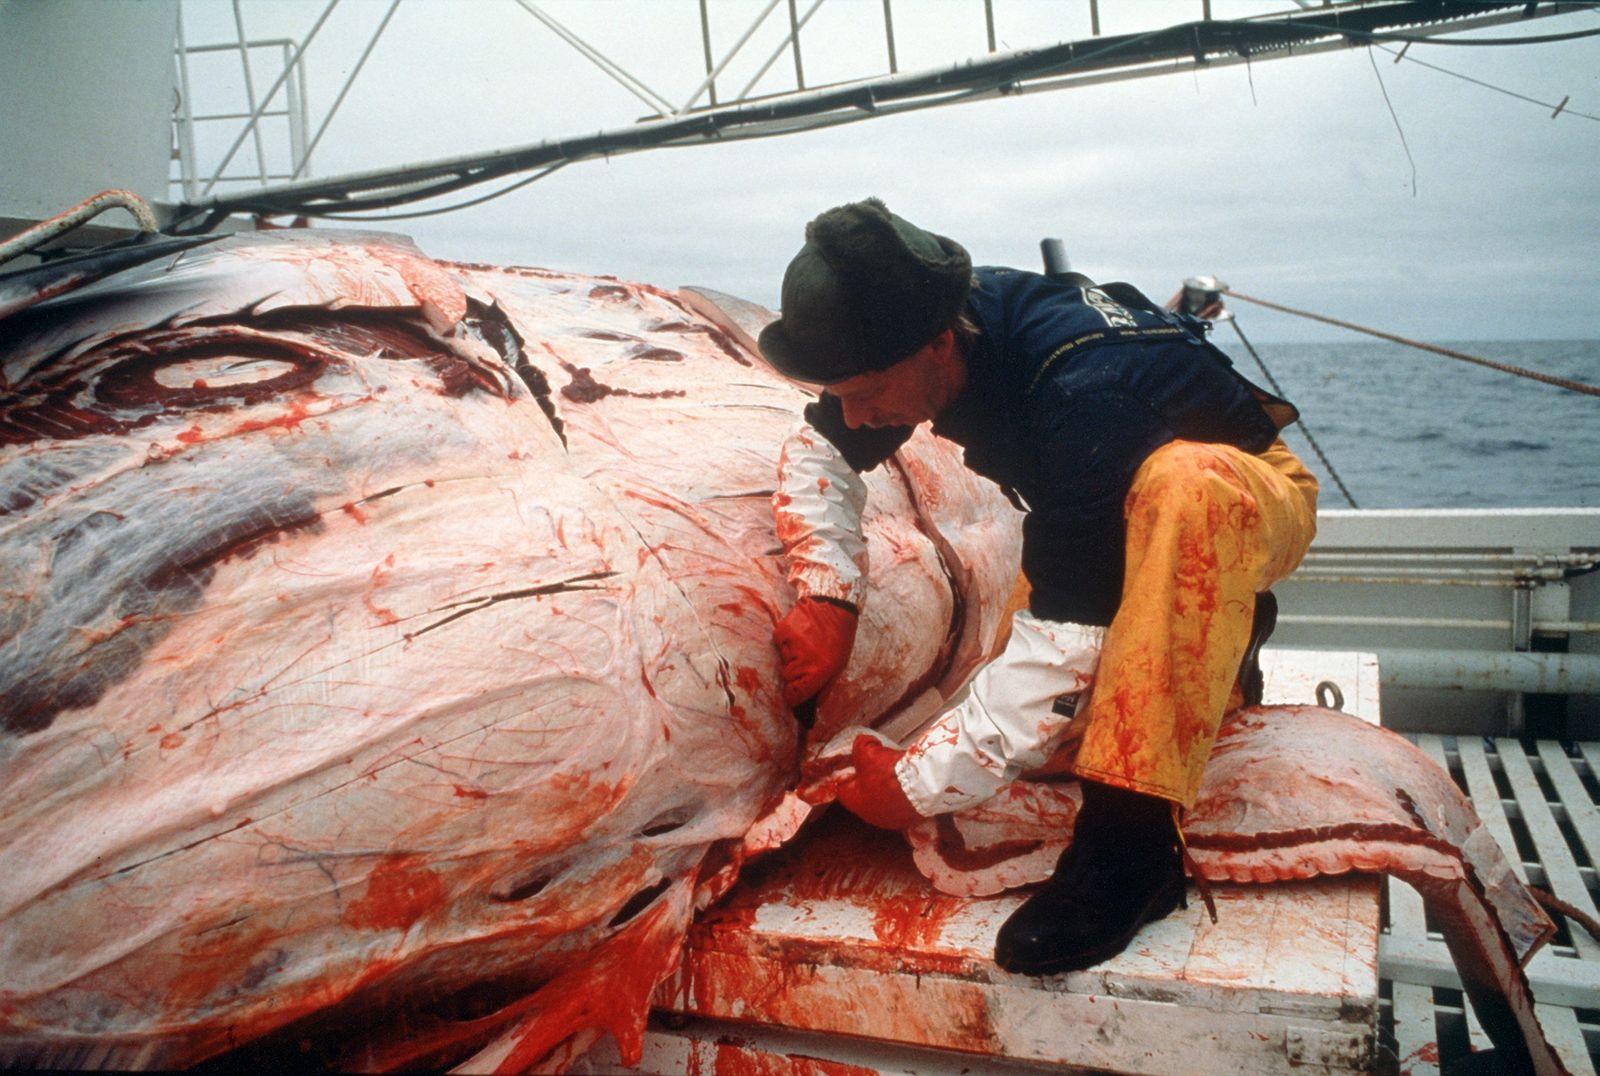 Norwegen wegen Walfang in der Kritik